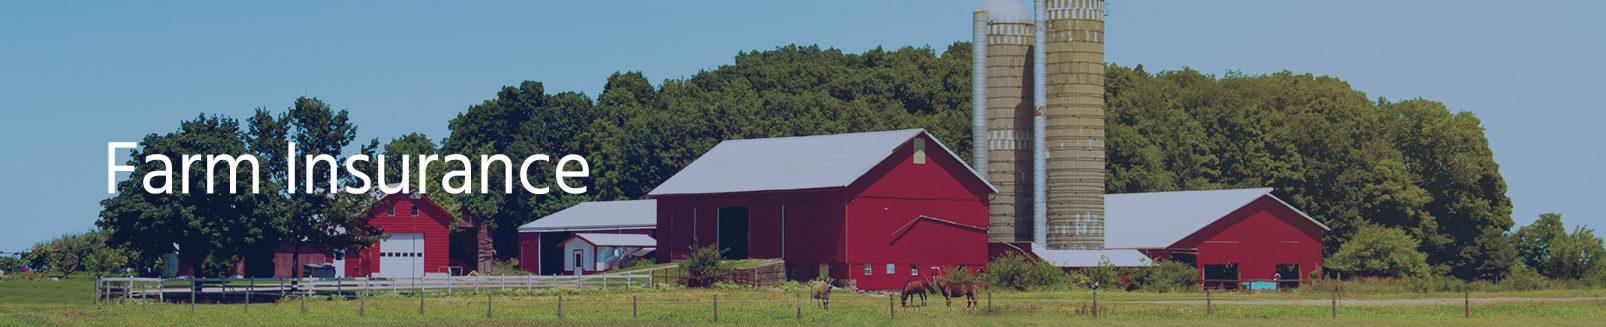 Local Farm Insurance in Ontario